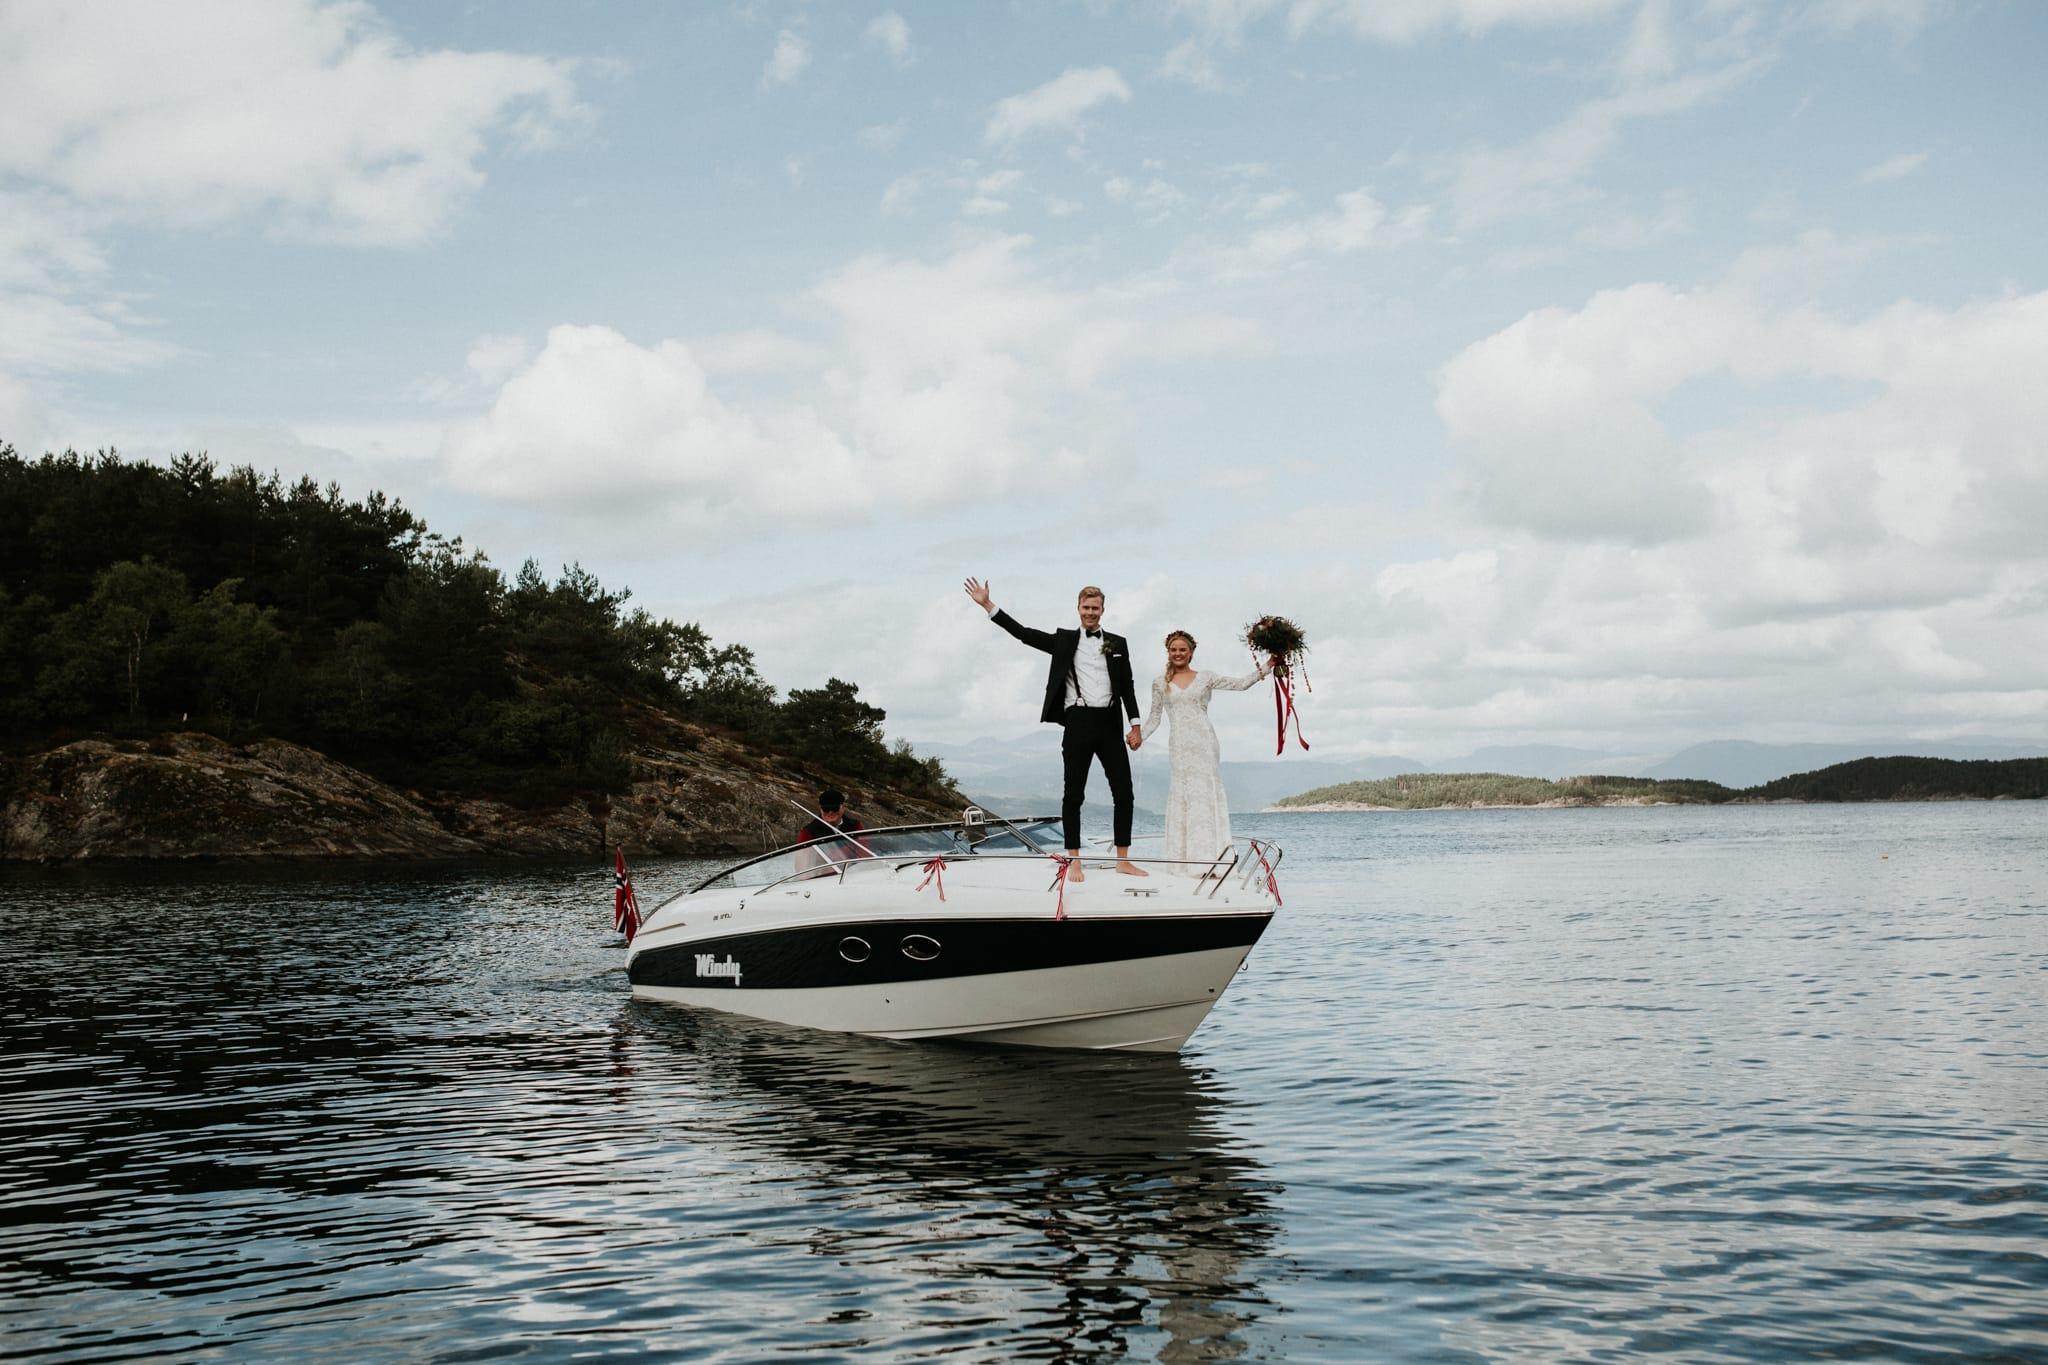 Norway-wedding-photographer.jpg